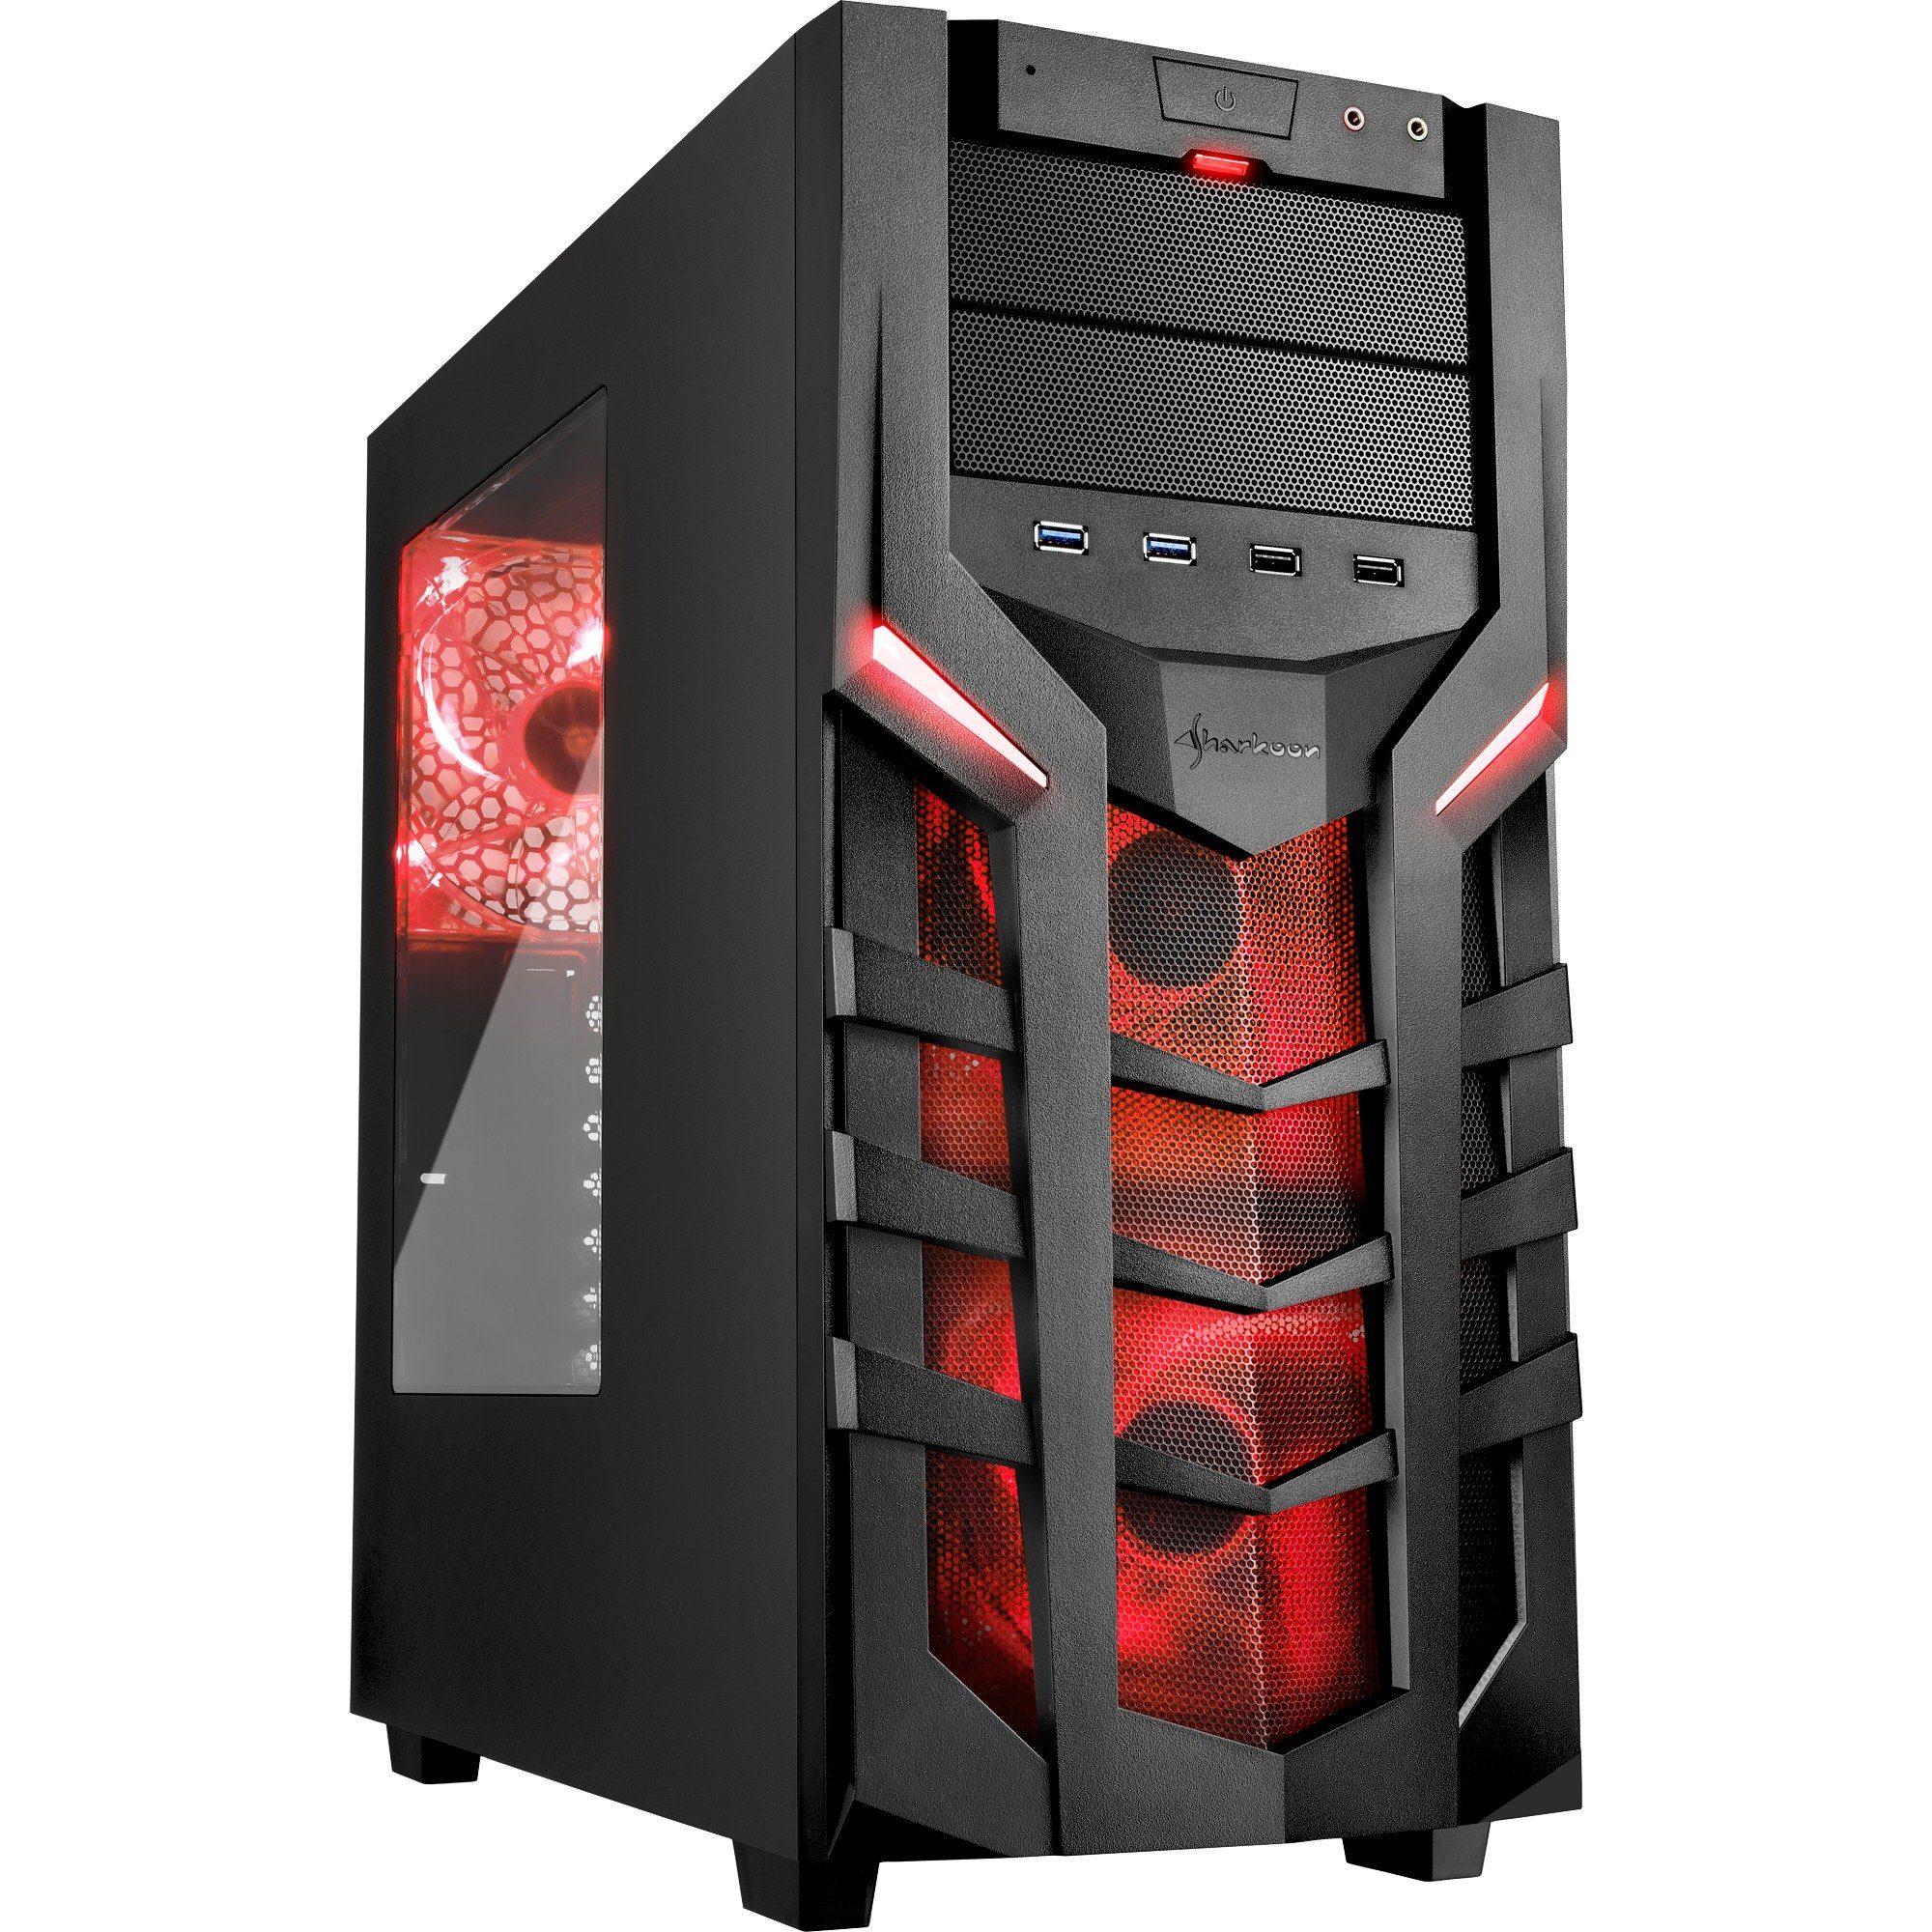 Sharkoon Tower-Gehäuse »DG7000 red«